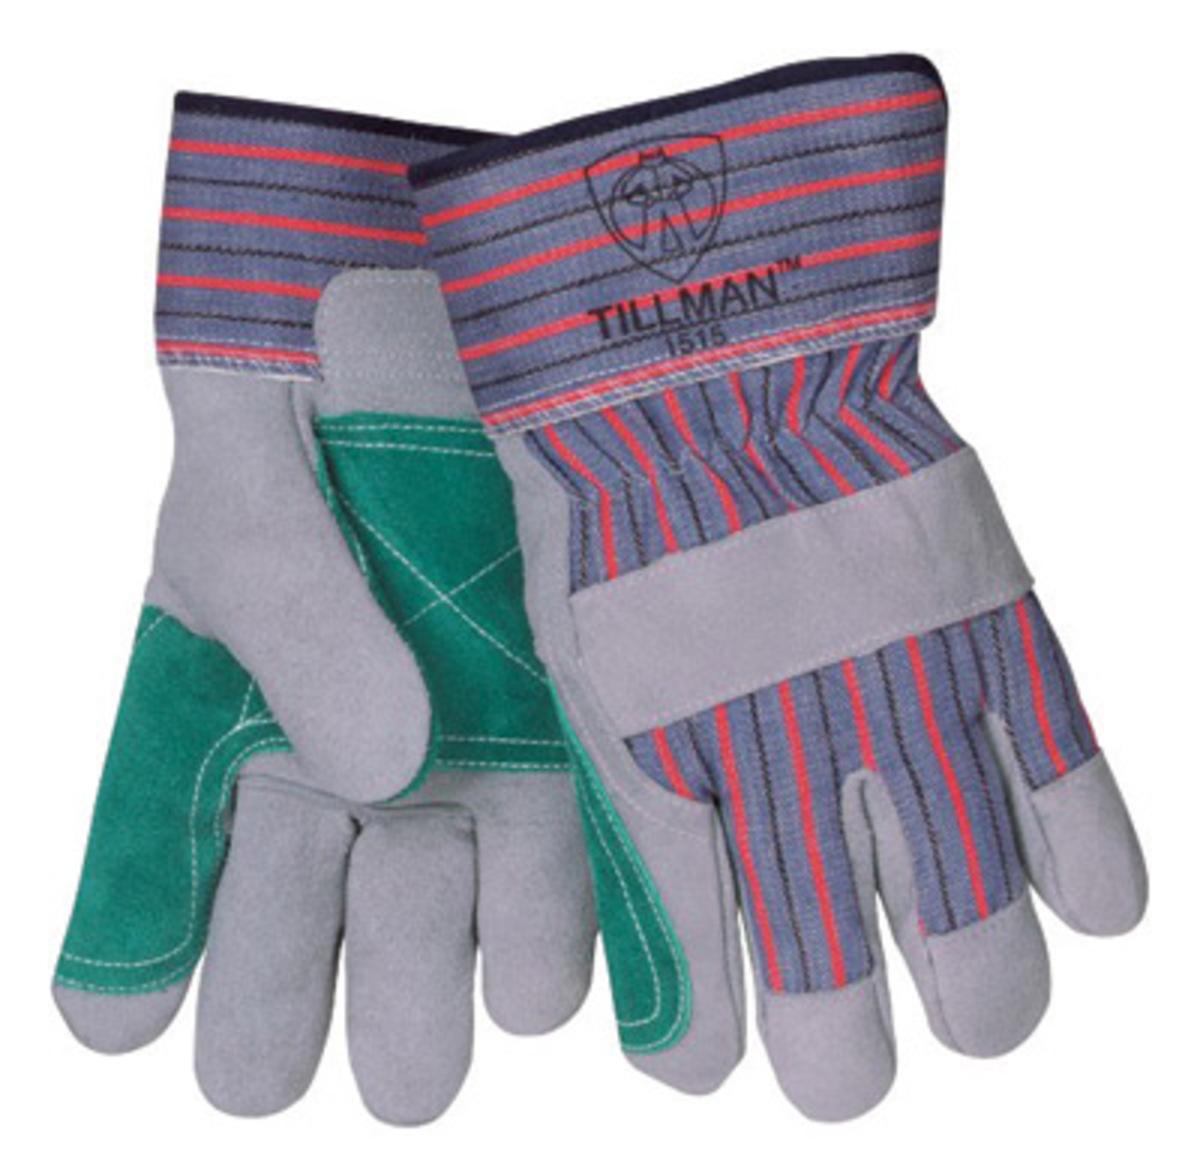 Tillman leather work gloves - Tillman Work Gloves Best 2017